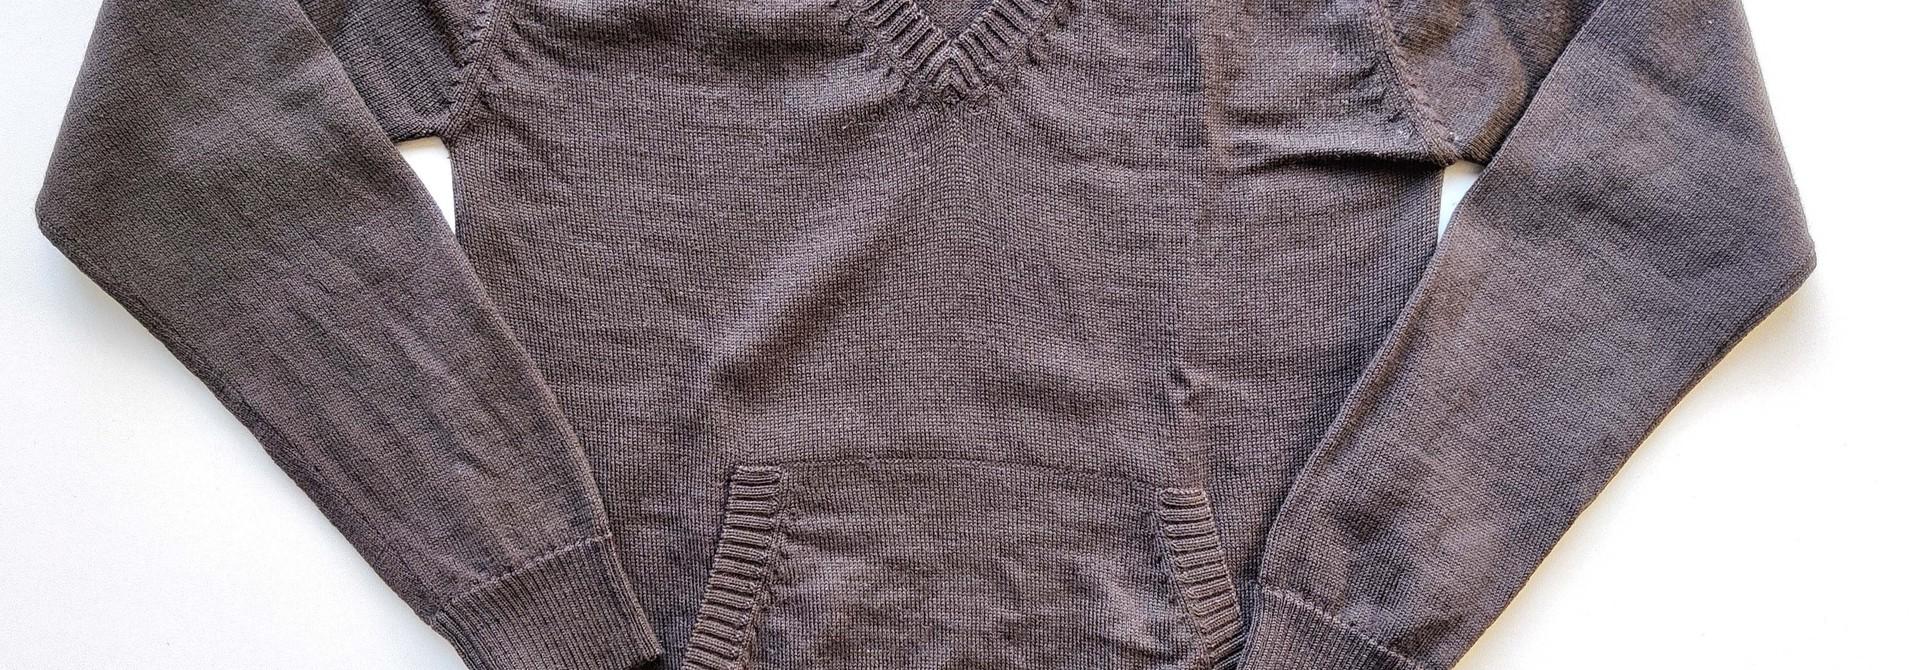 Sweater Hilde & Co